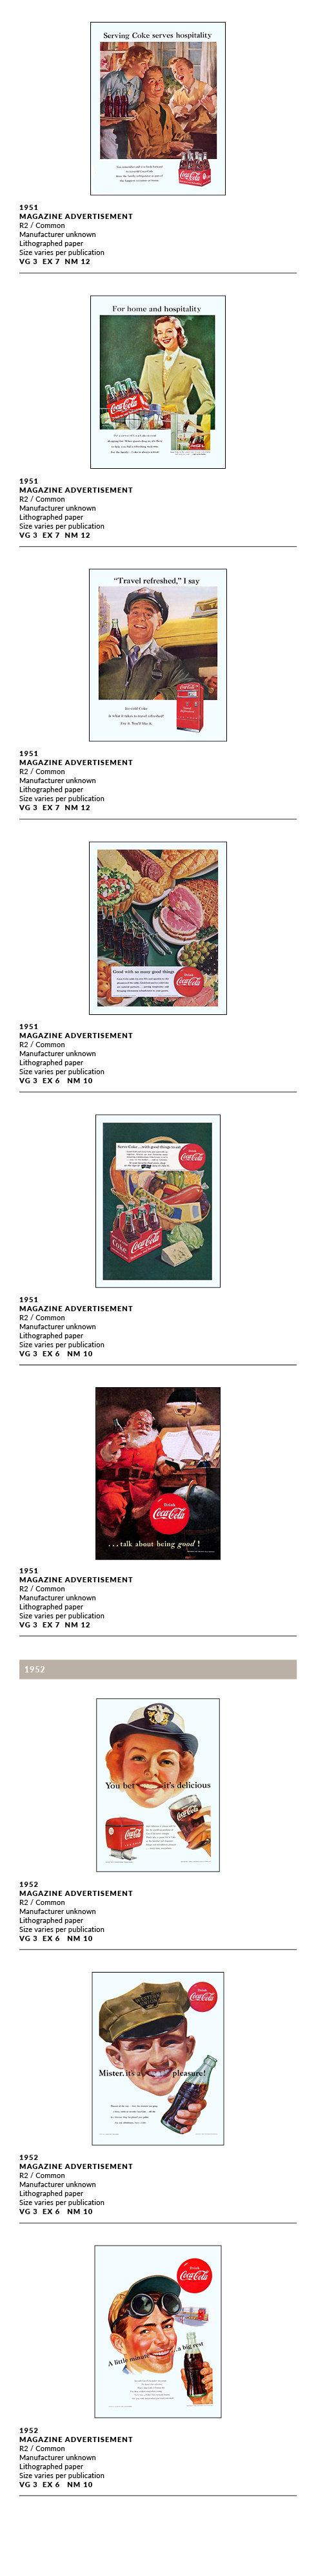 1950-54 Ads4.jpg